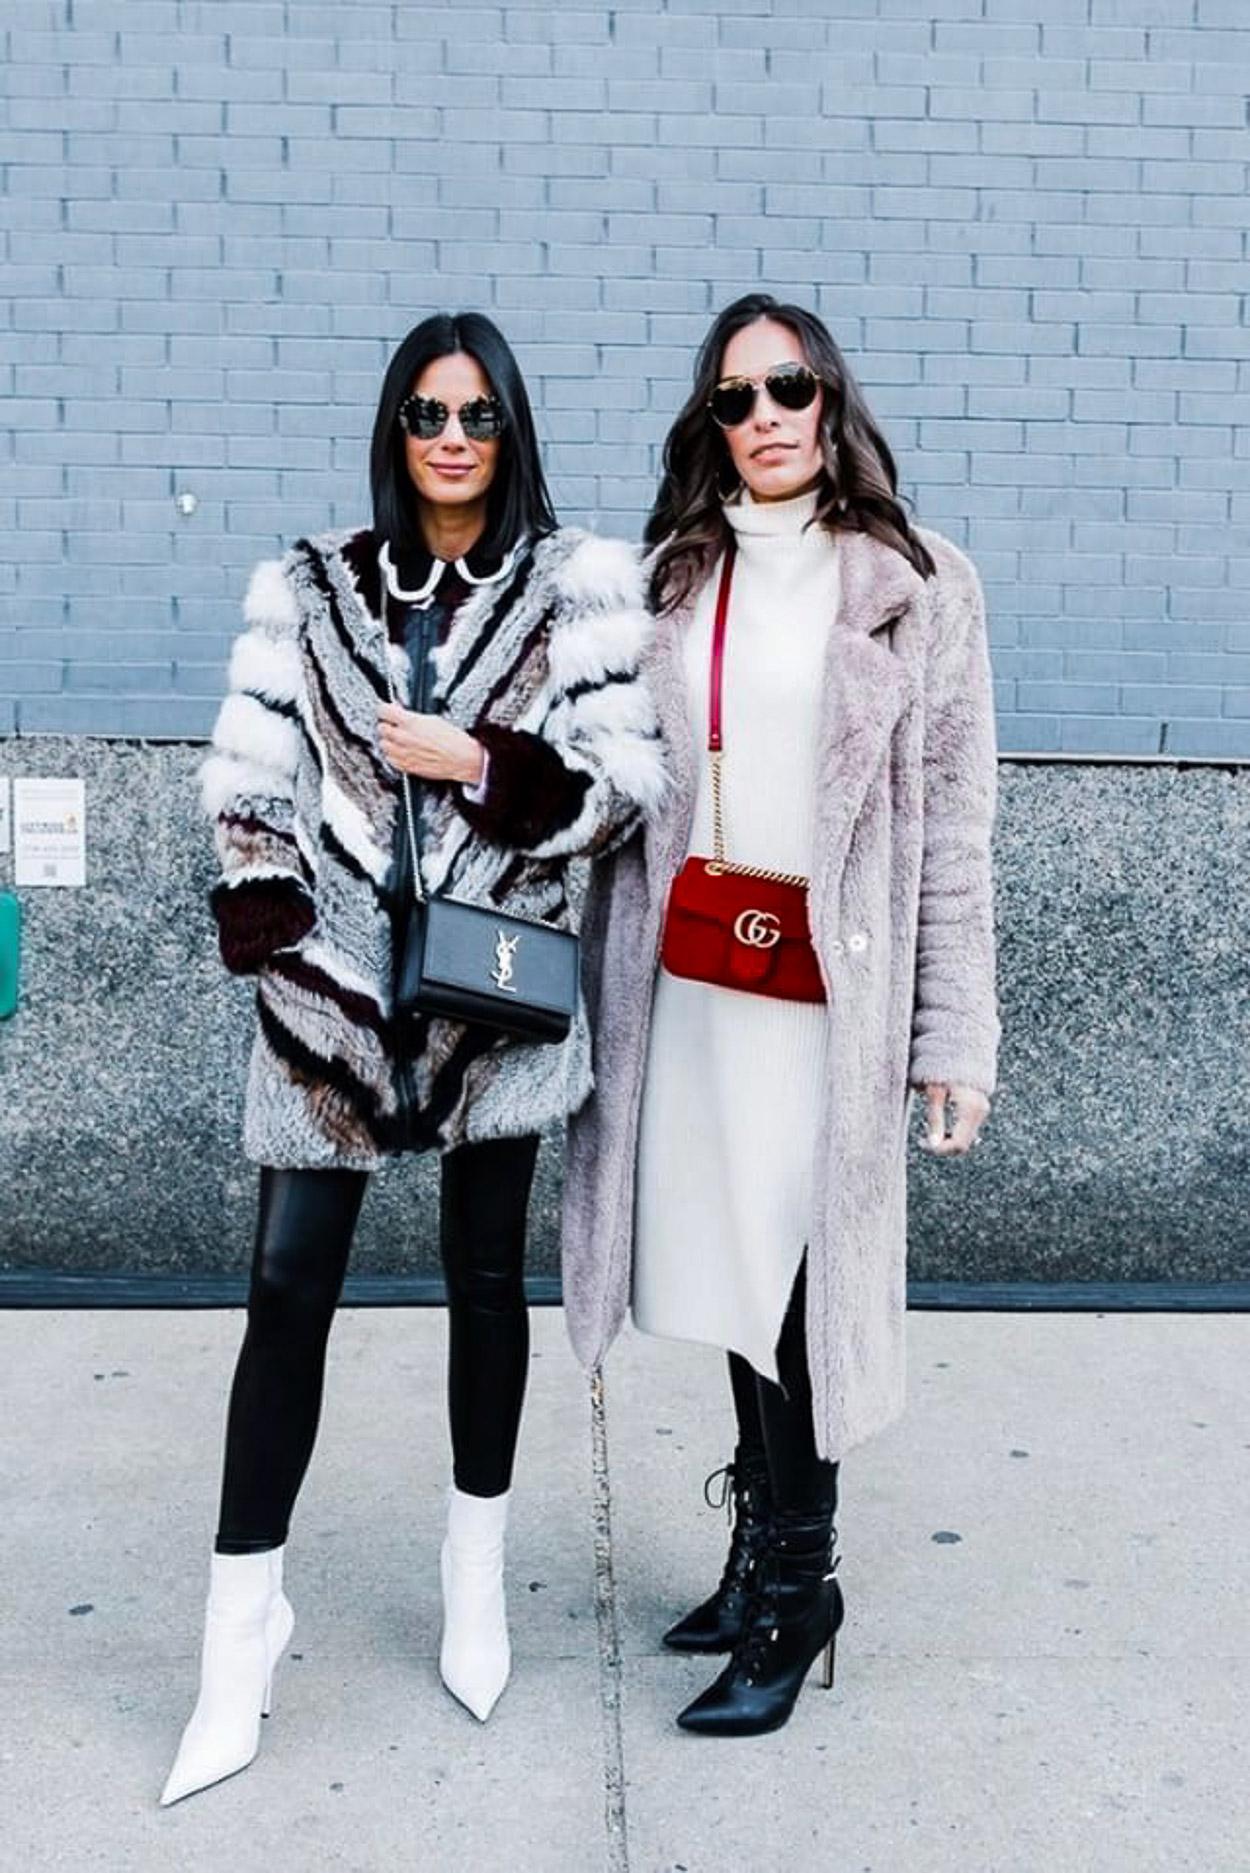 ff61794b1b0 nyfw-18-day-1-friends-lovers-teddy-coat-hm-sweater-dress-red-velvet-gucci- marmont-bag-aglamlifestyle-fashion-week-5